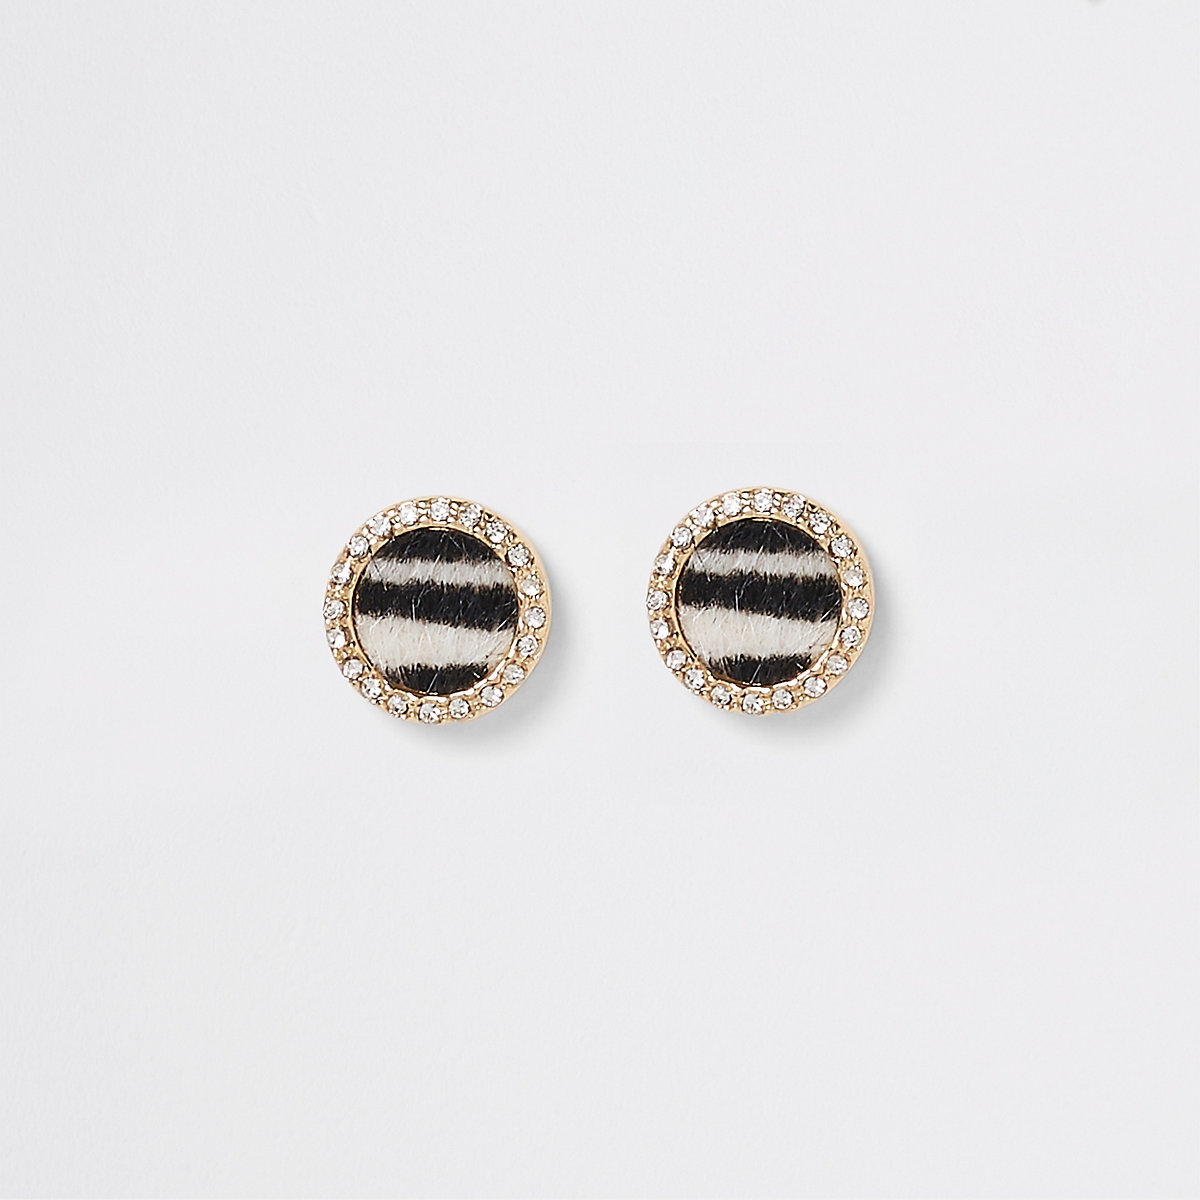 Black zebra print diamante stud earrings